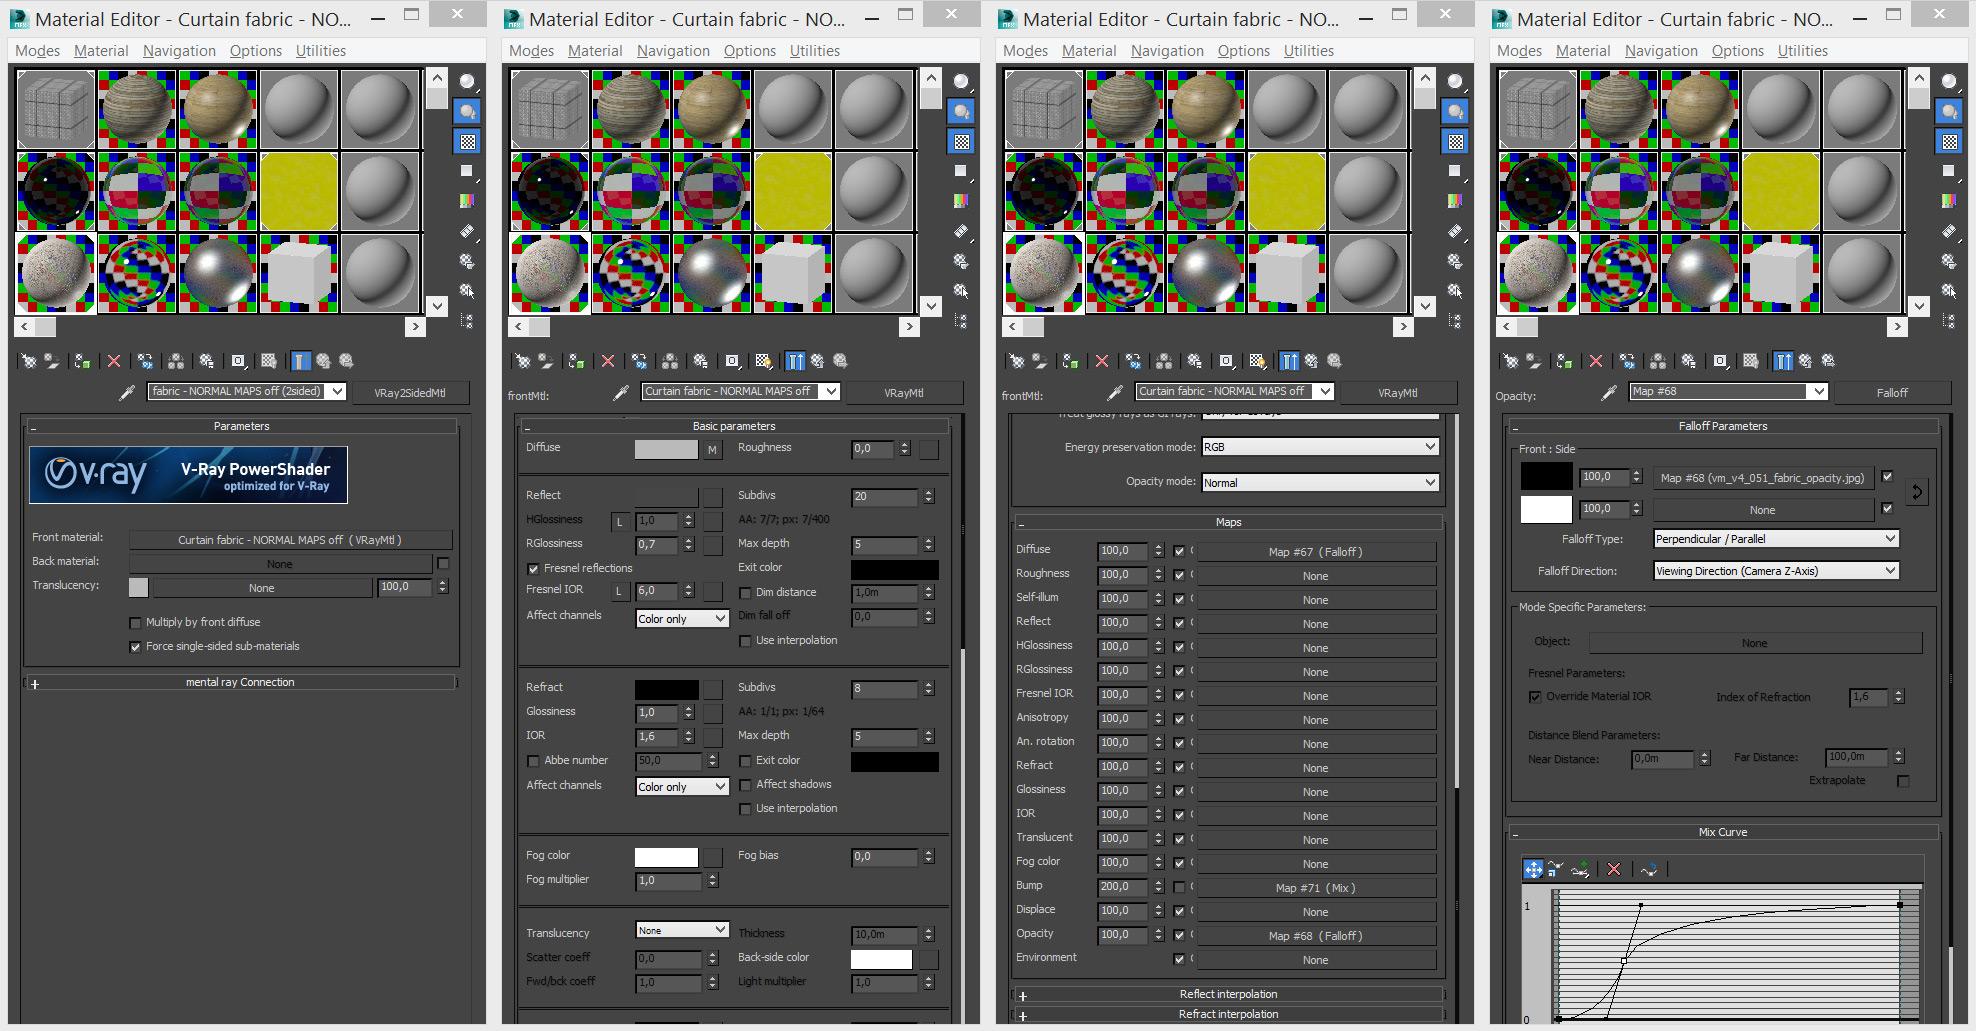 Tuto_cabin_lake_Mat_Curtains_Material_editor_settings.jpg